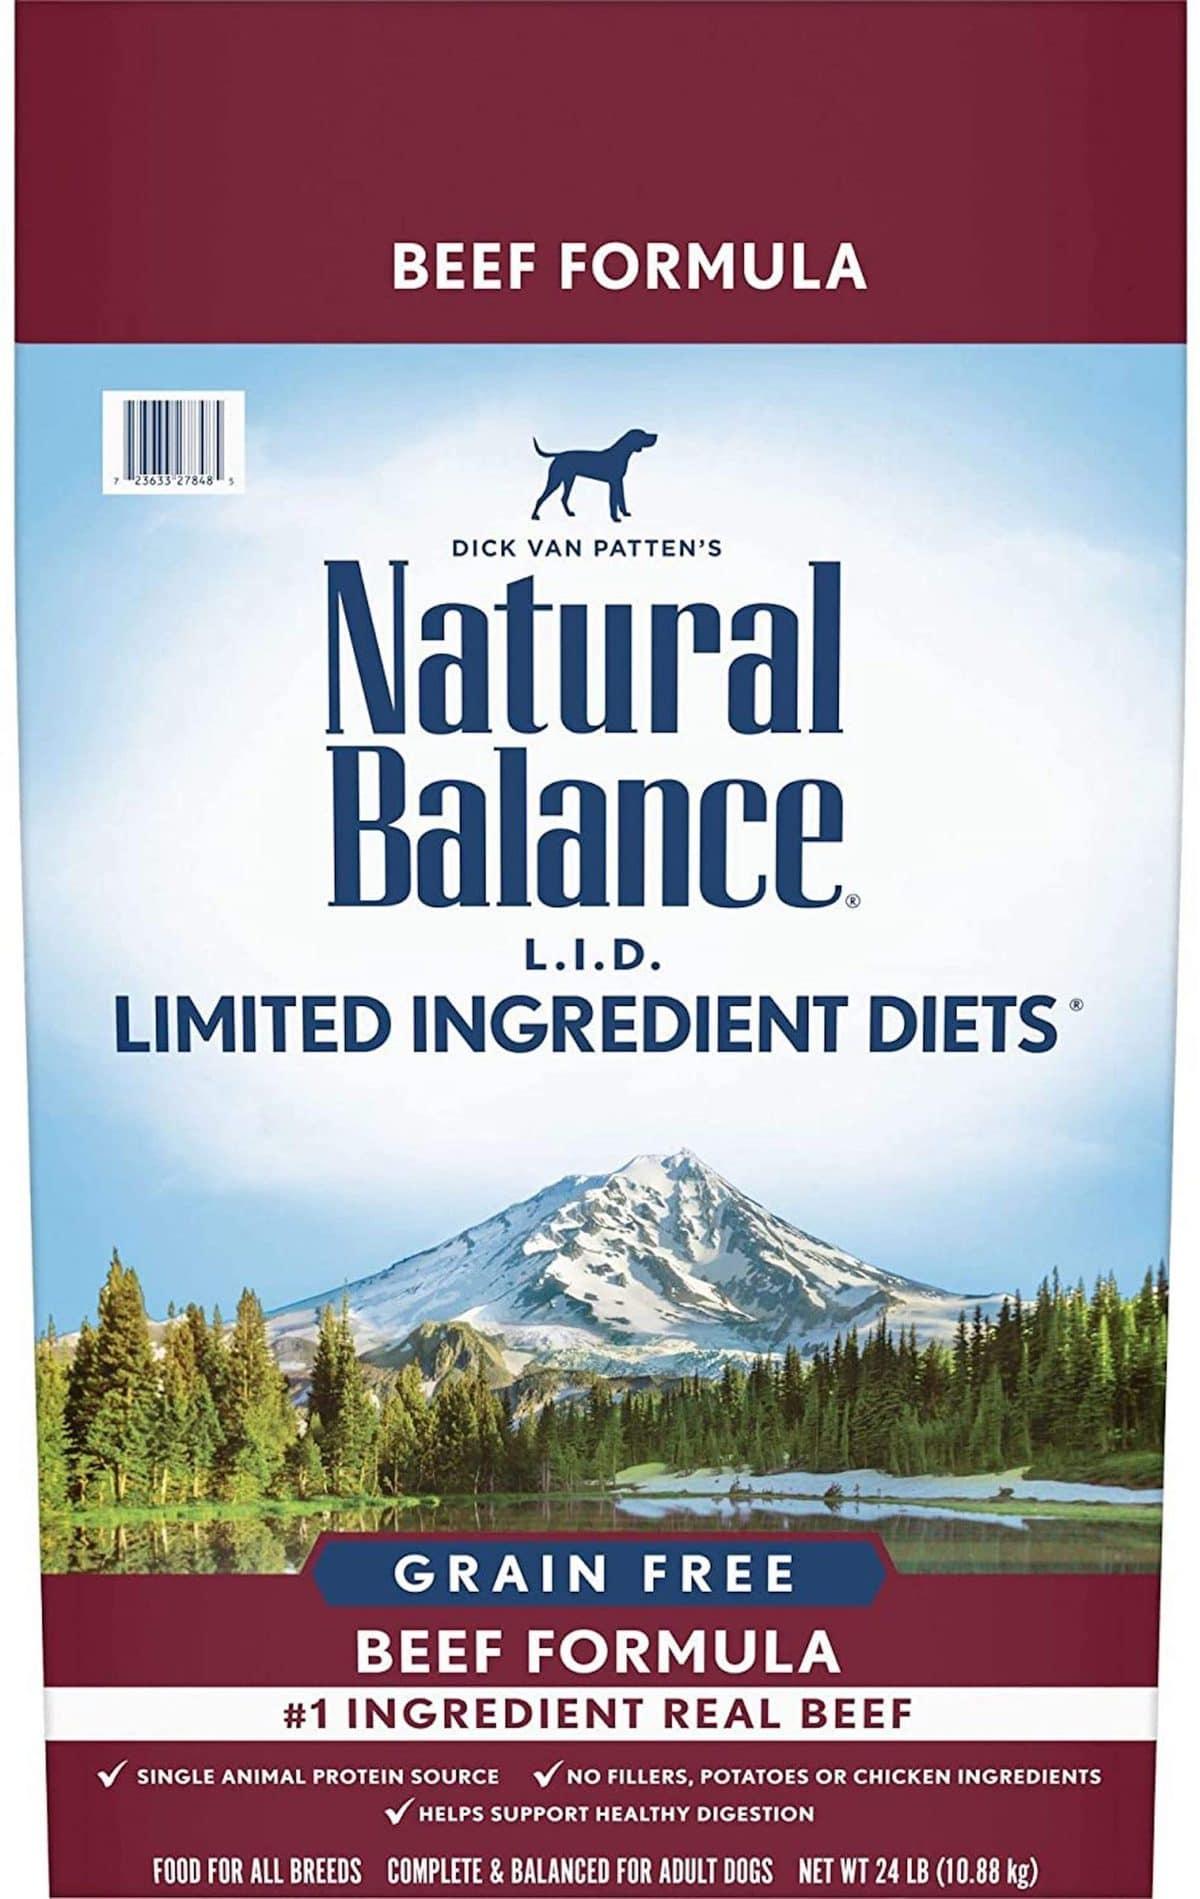 Natural Balanced LID Beef